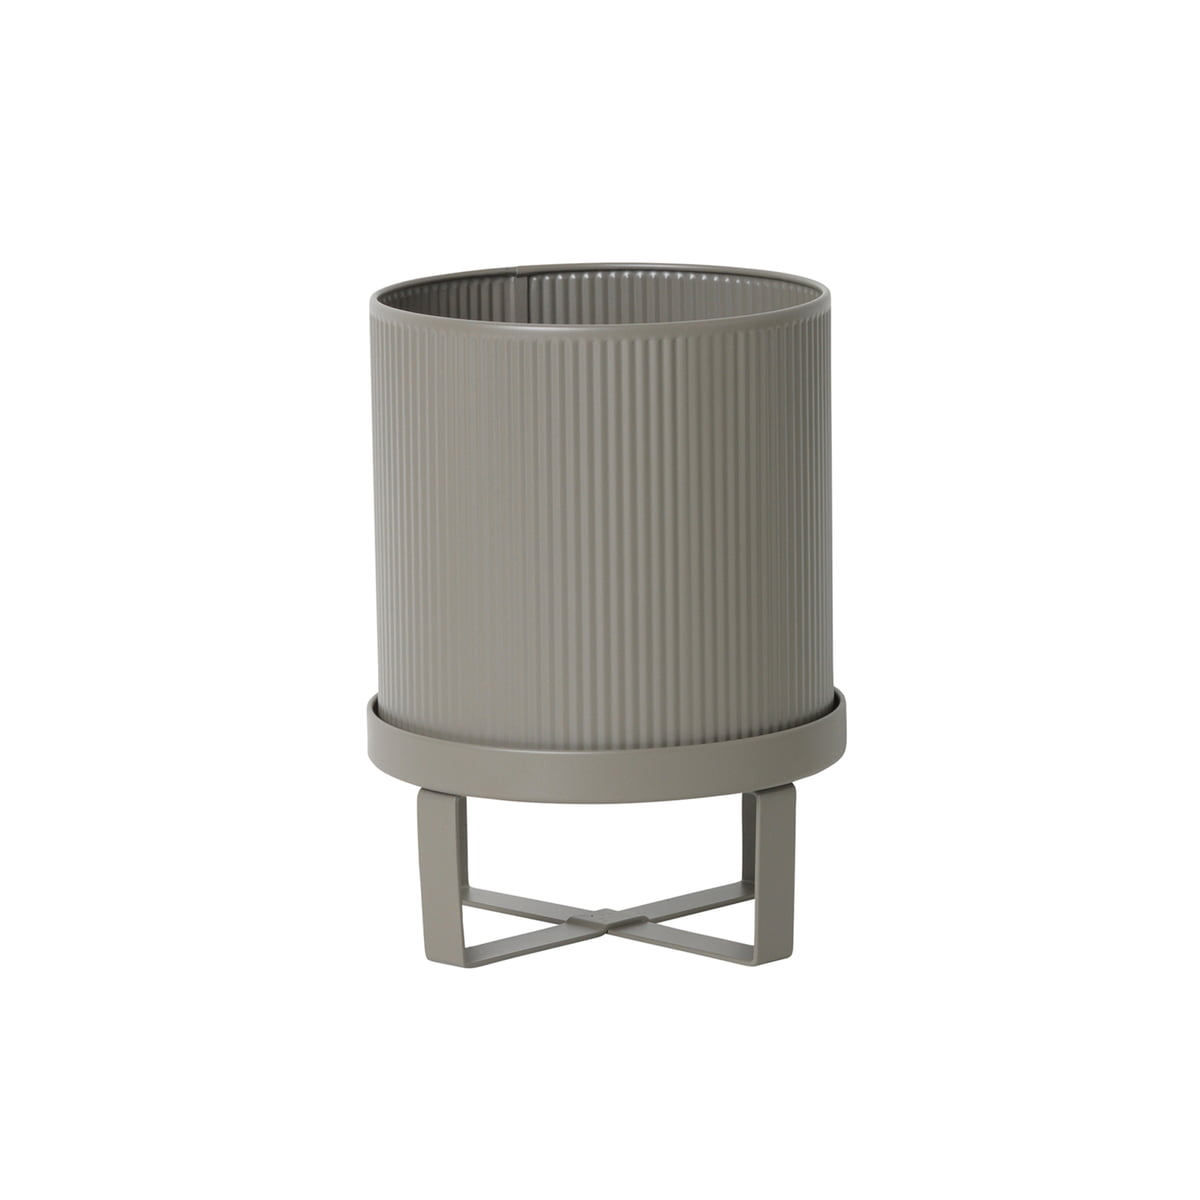 Bau Pflanztopf, Ø 18 X H 24 Cm Von Ferm Living In Warm Grau